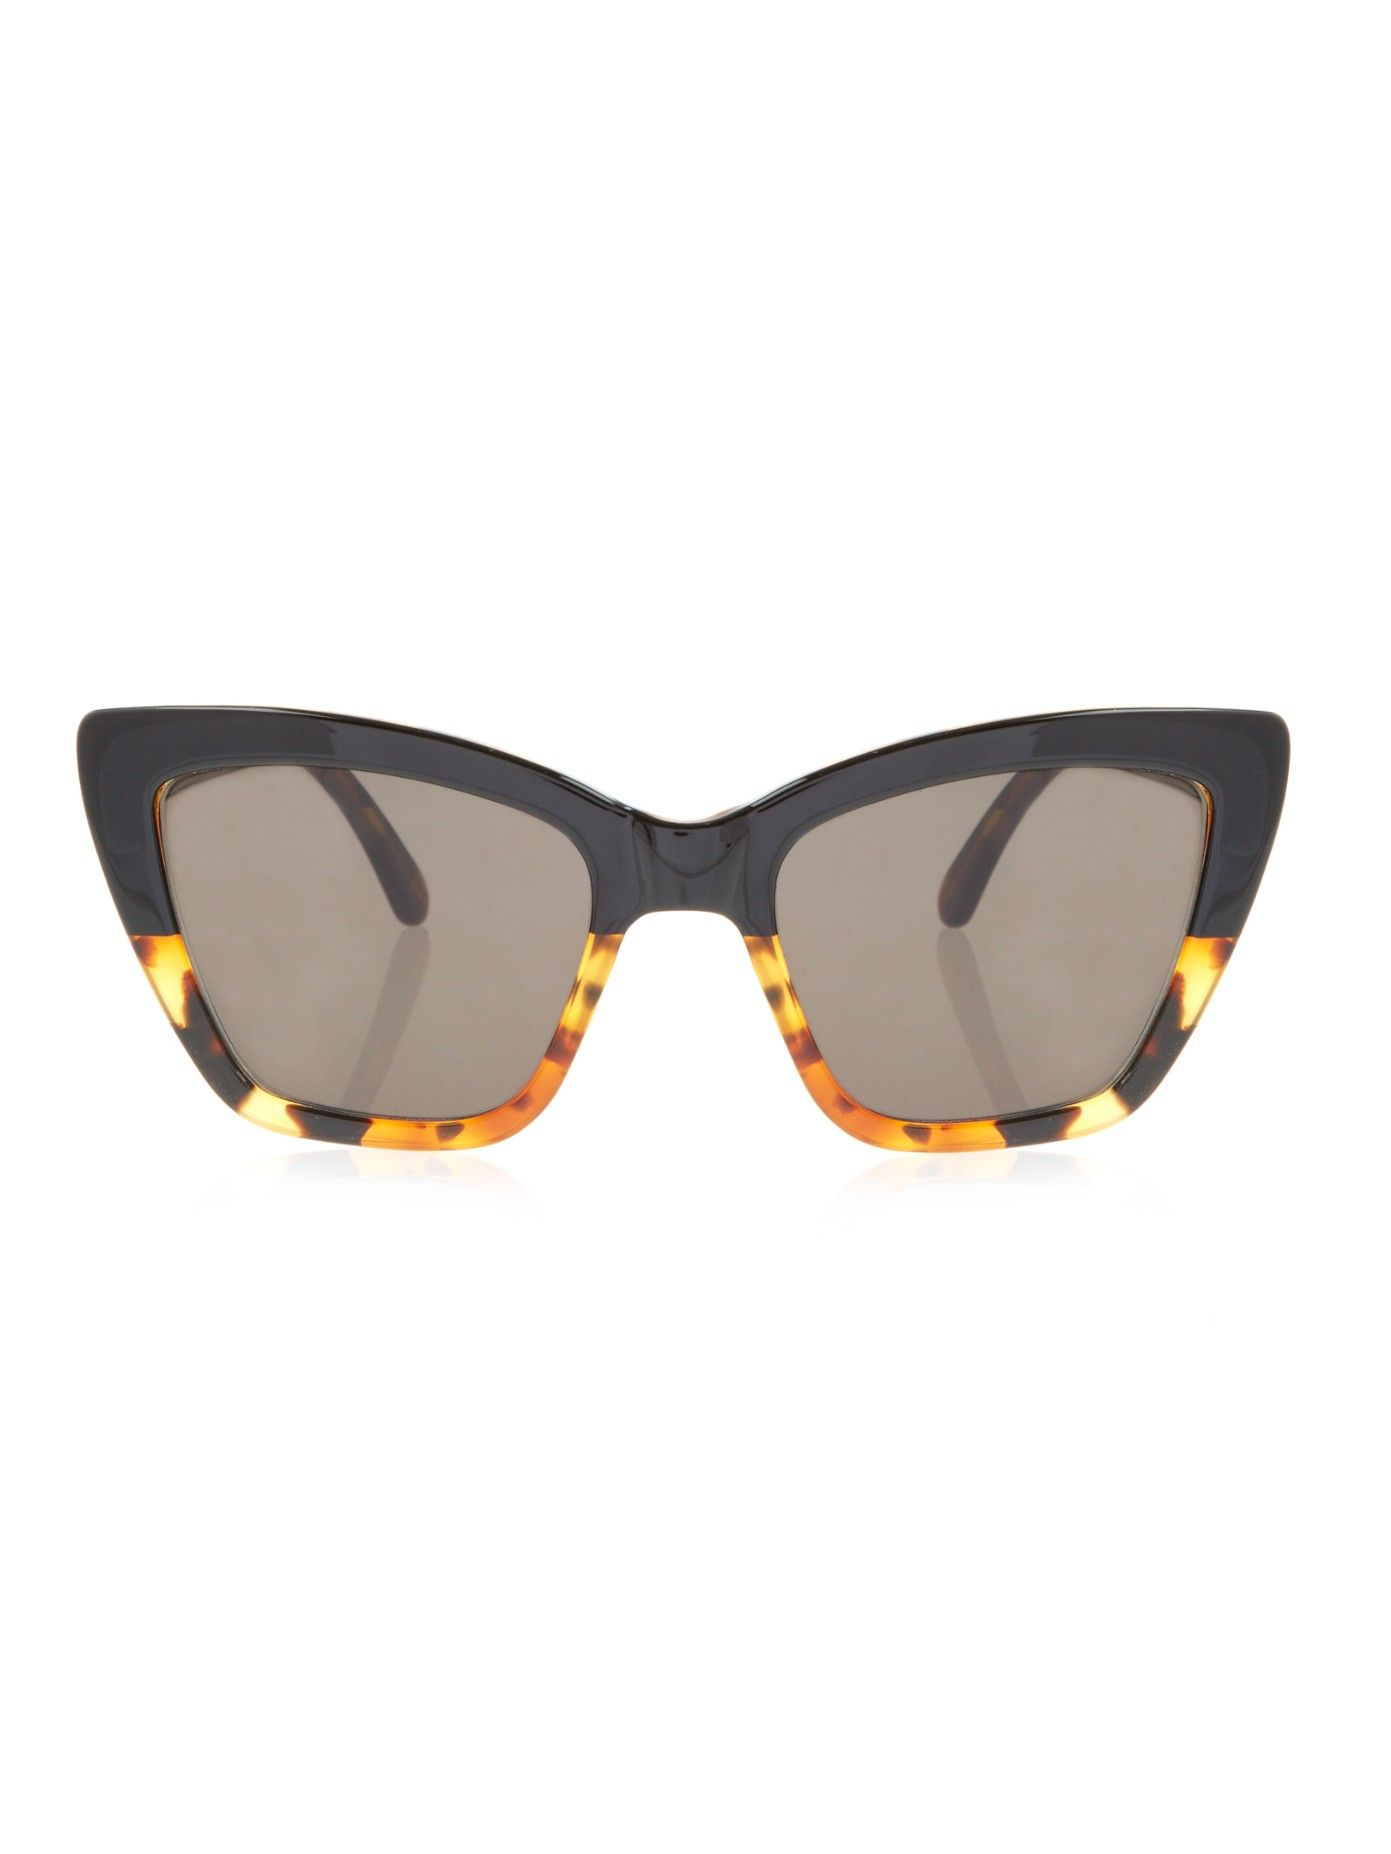 8aef60db1f Calvi two-tone cat-eye sunglasses